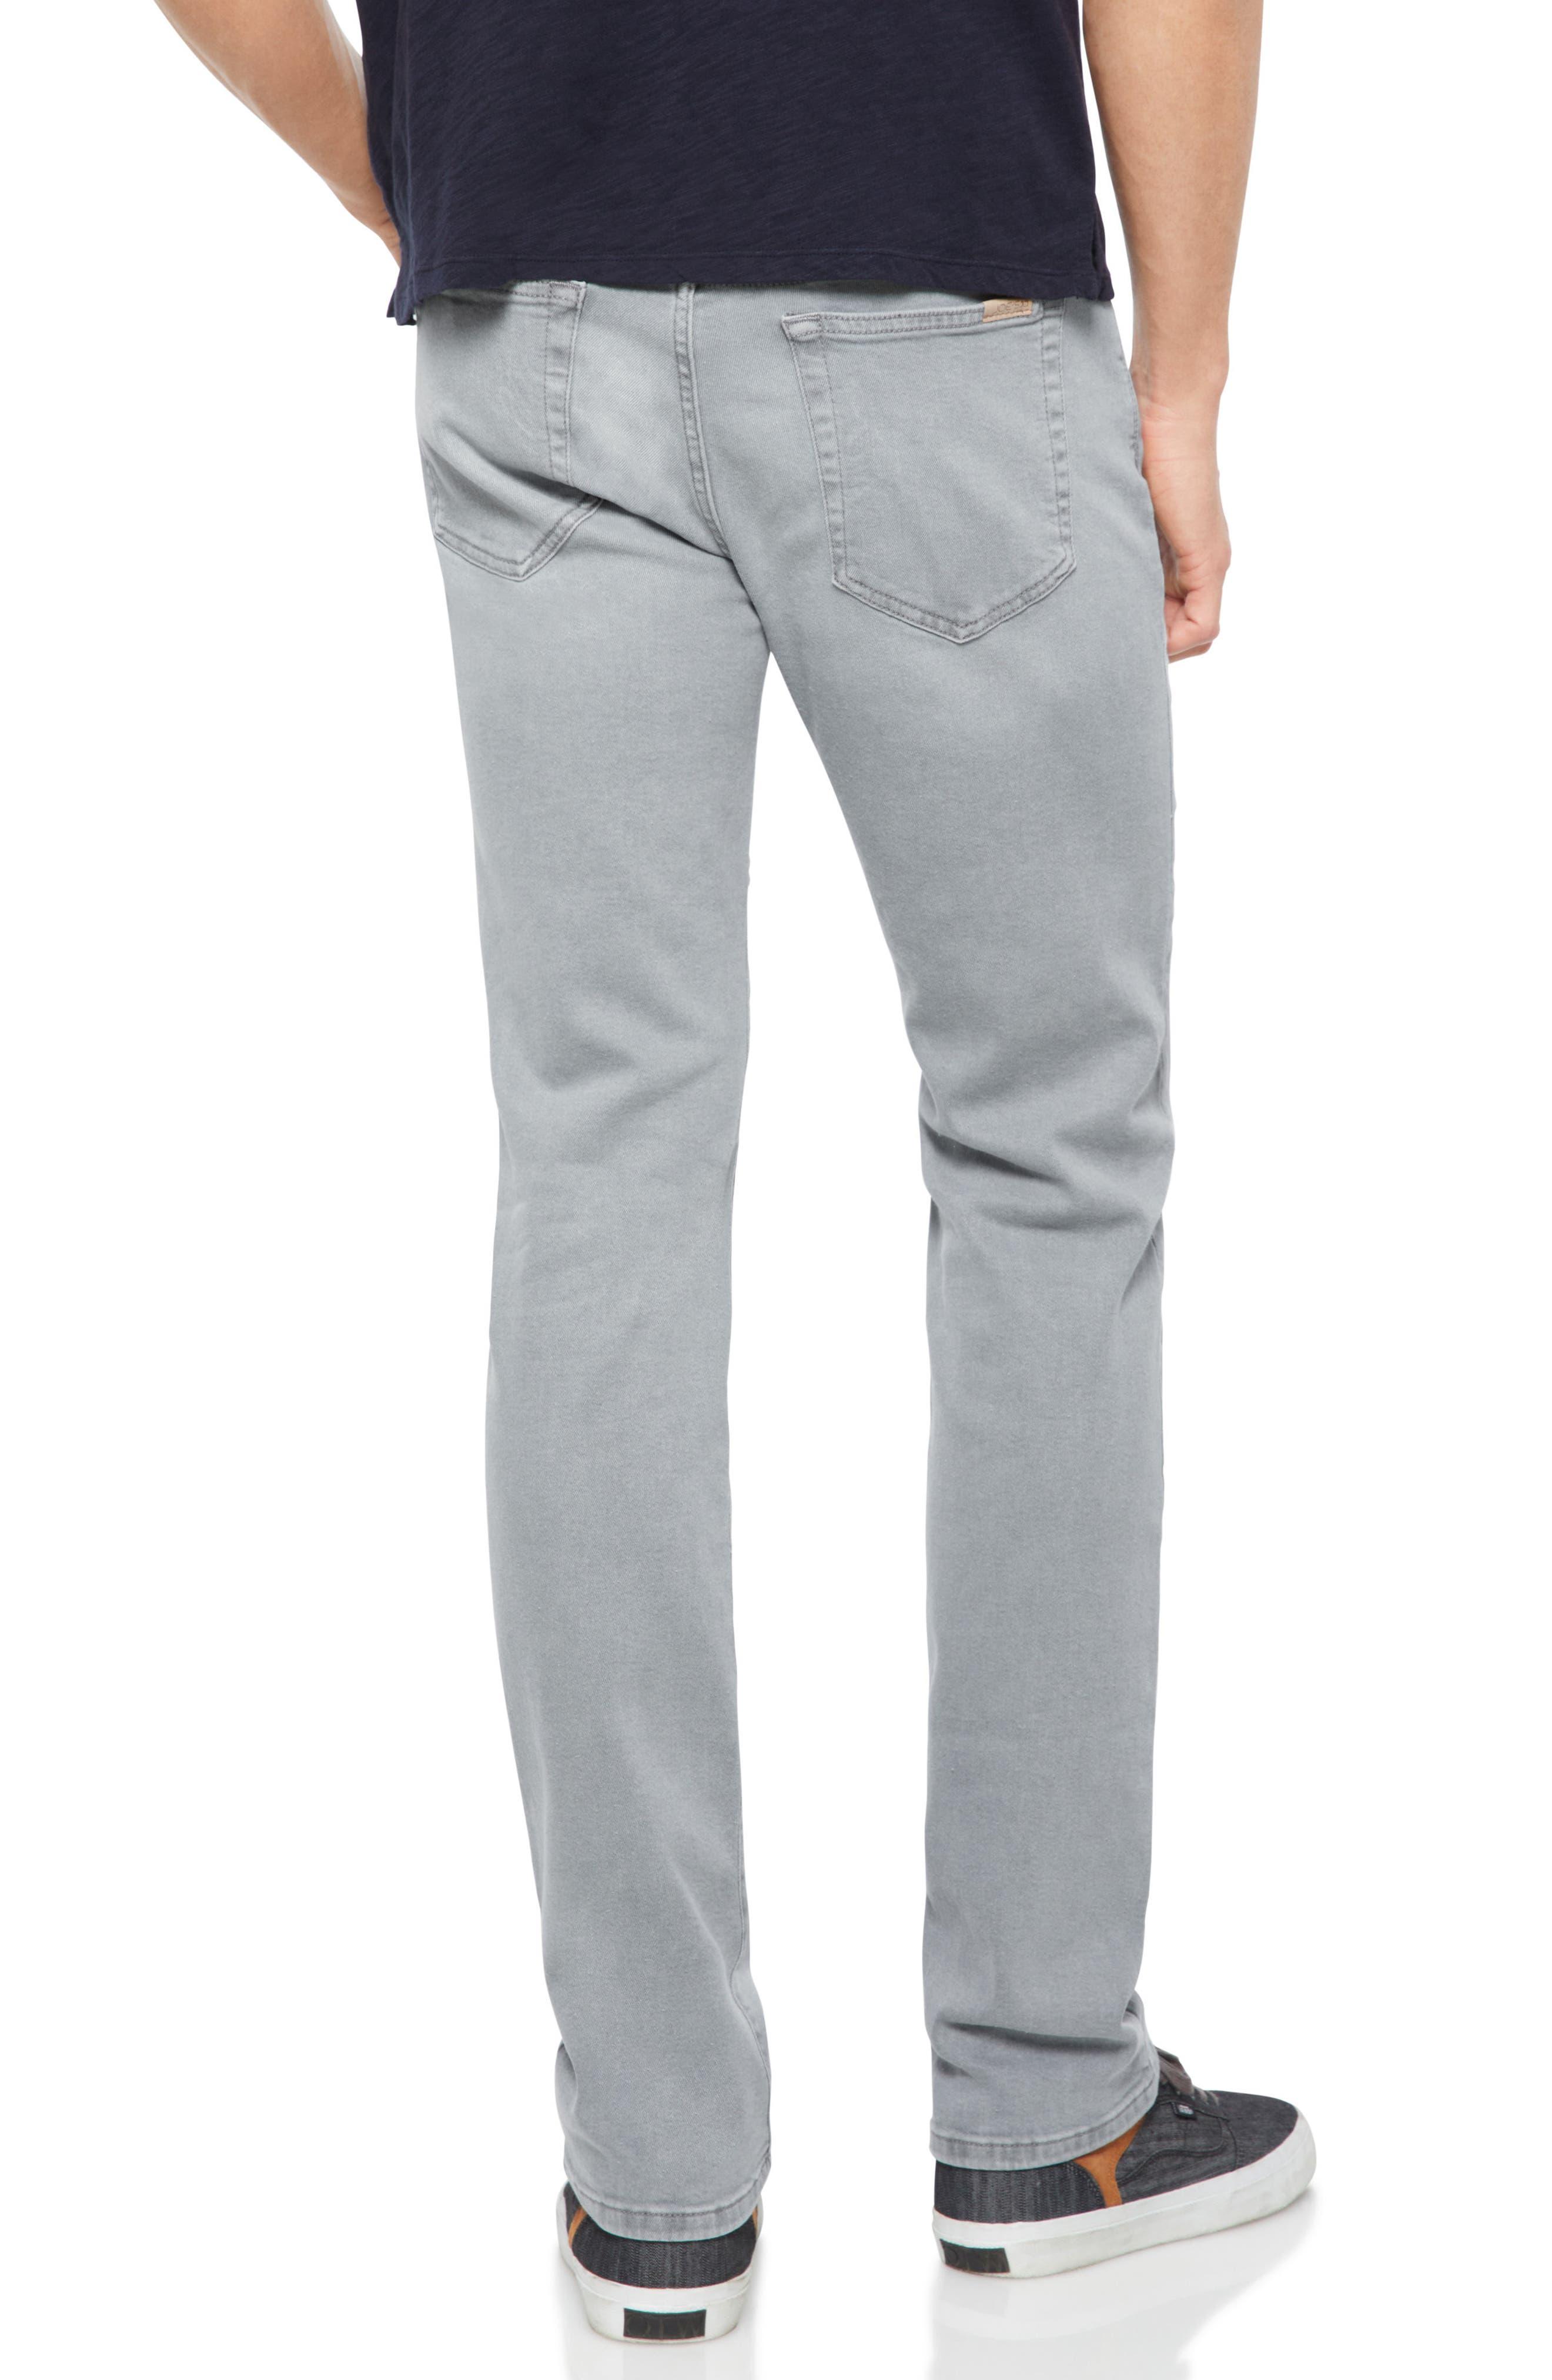 Brixton Slim Straight Leg Jeans,                             Alternate thumbnail 2, color,                             Feather